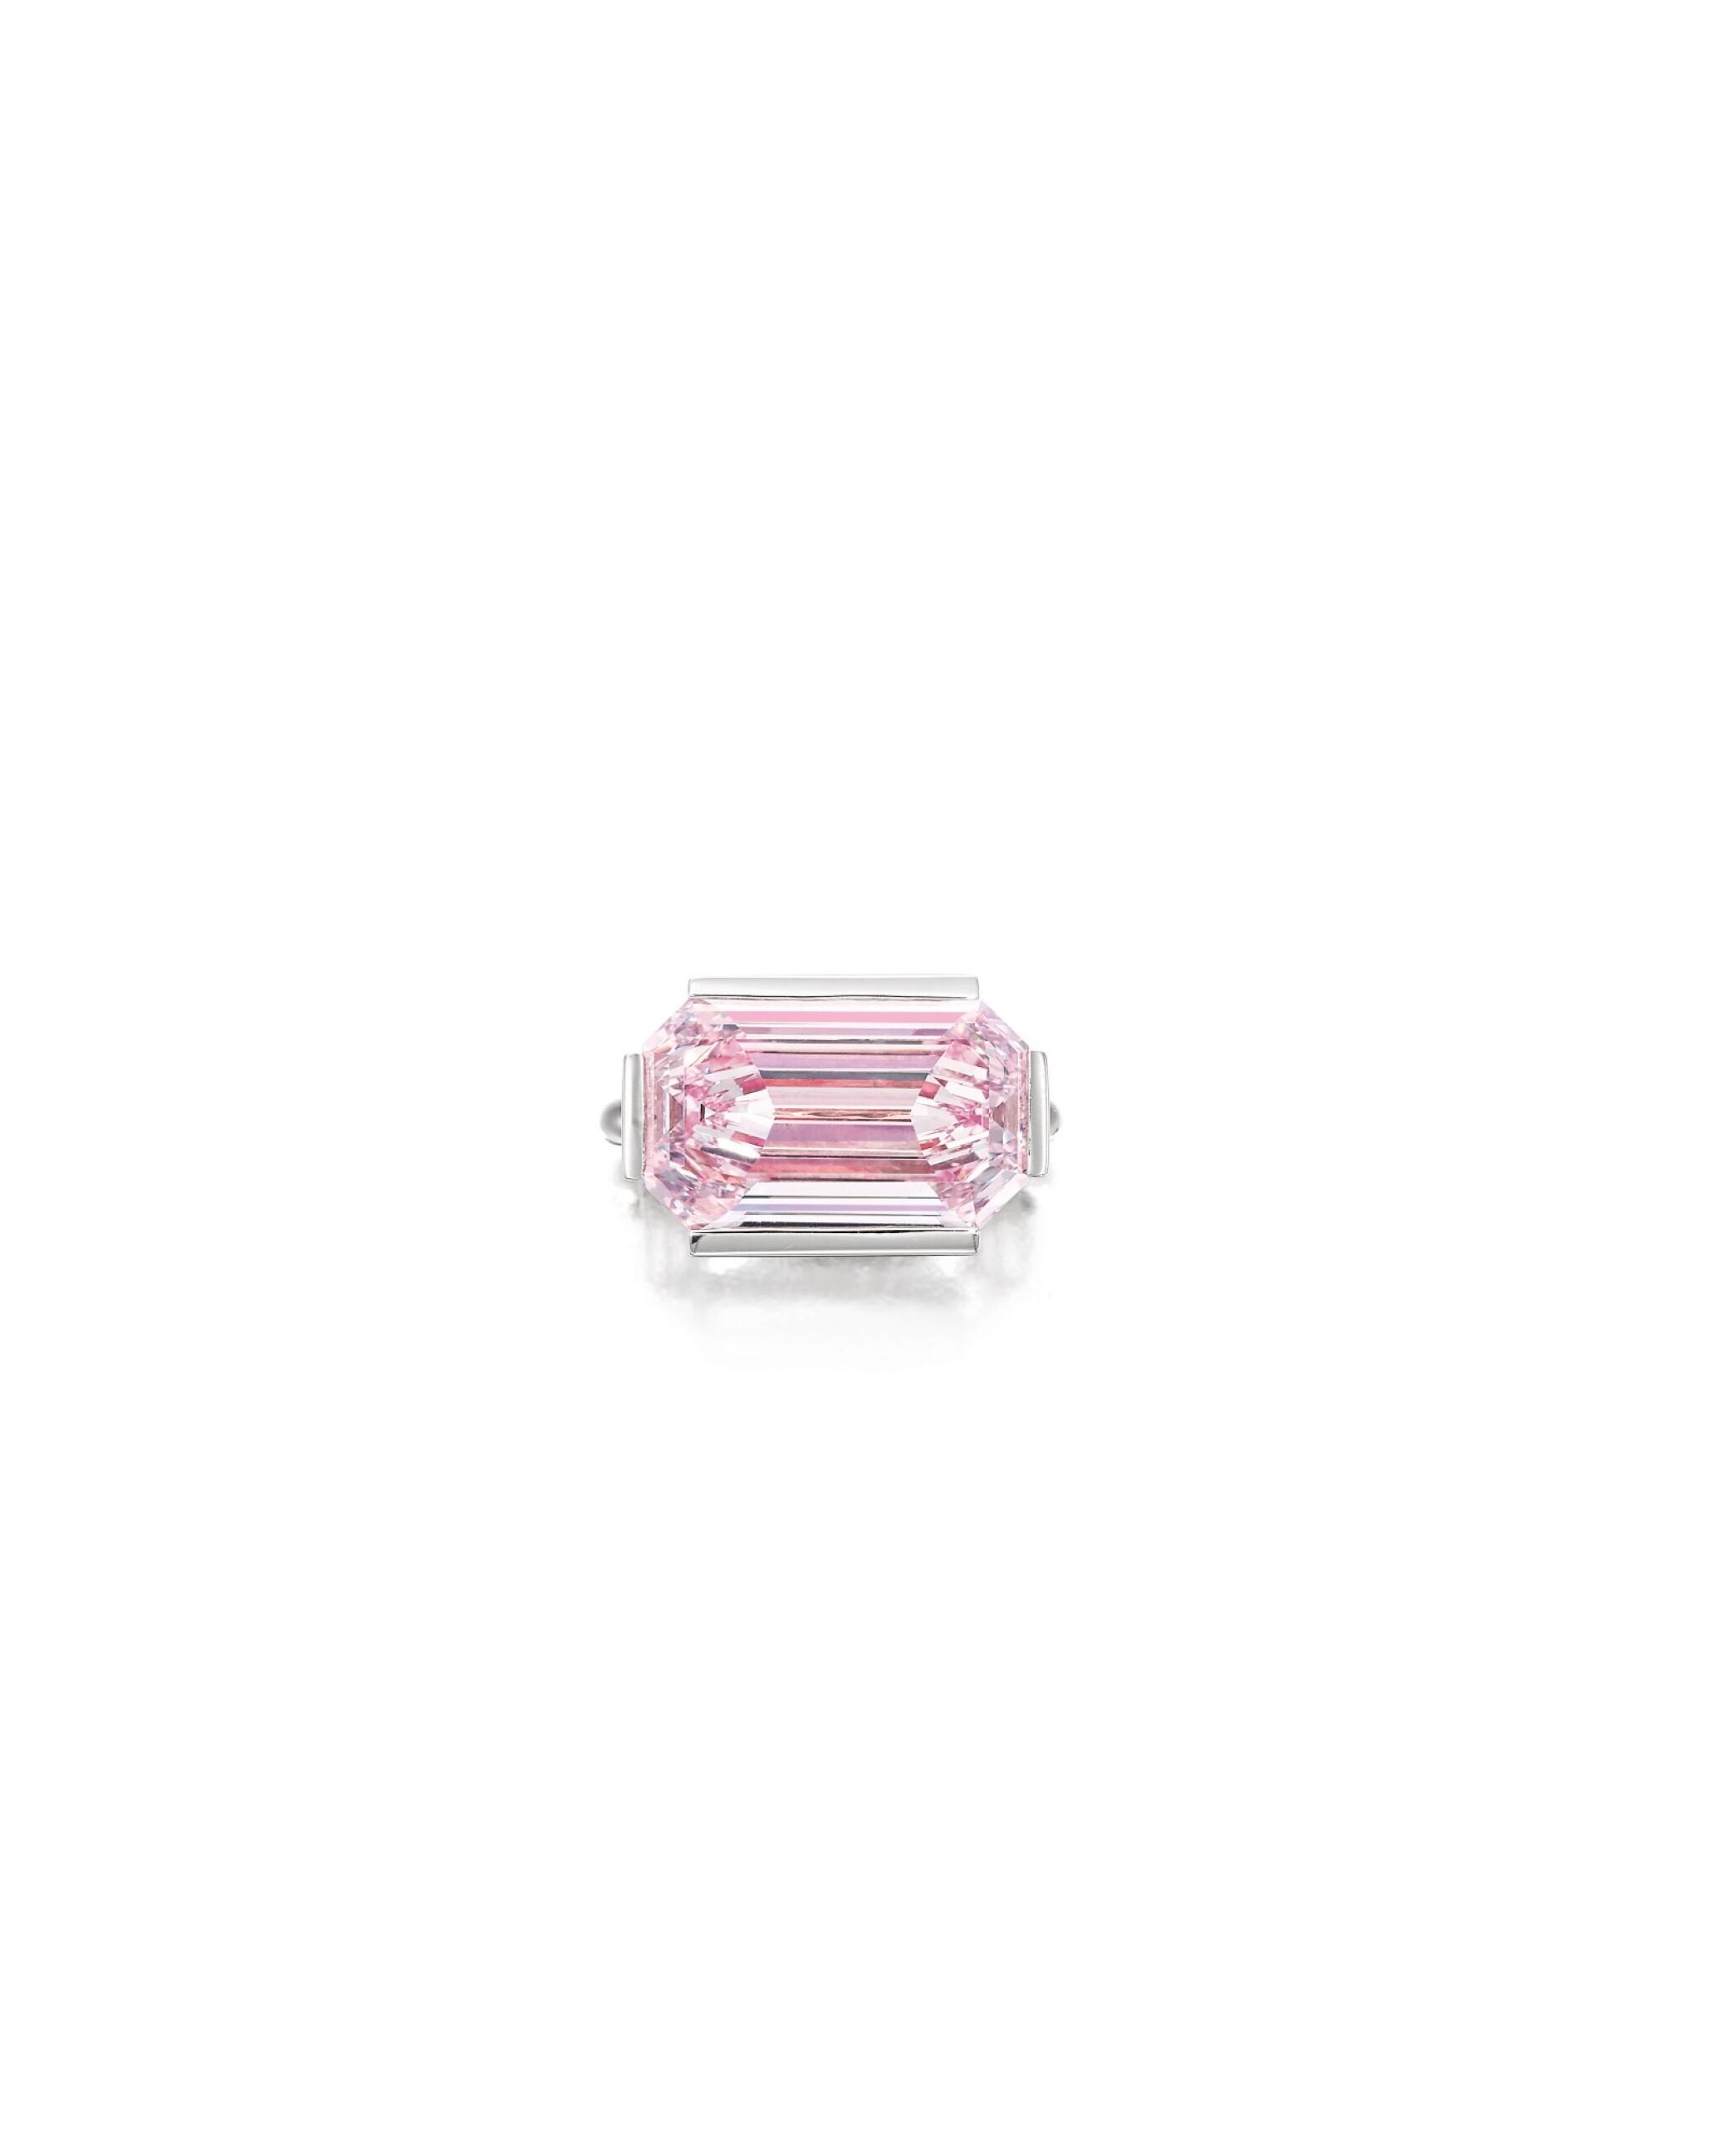 View full screen - View 1 of Lot 1759. Sotheby's Diamonds by Joseph Ramsay | 'Dam' Fancy Intense Purplish Pink Diamond and Diamond Ring | 「蘇富比鑽石」Joseph Ramsay 設計 |「傾城」7.00克拉 濃彩紫粉紅色 內部無瑕 鑽石 配 鑽石 戒指.